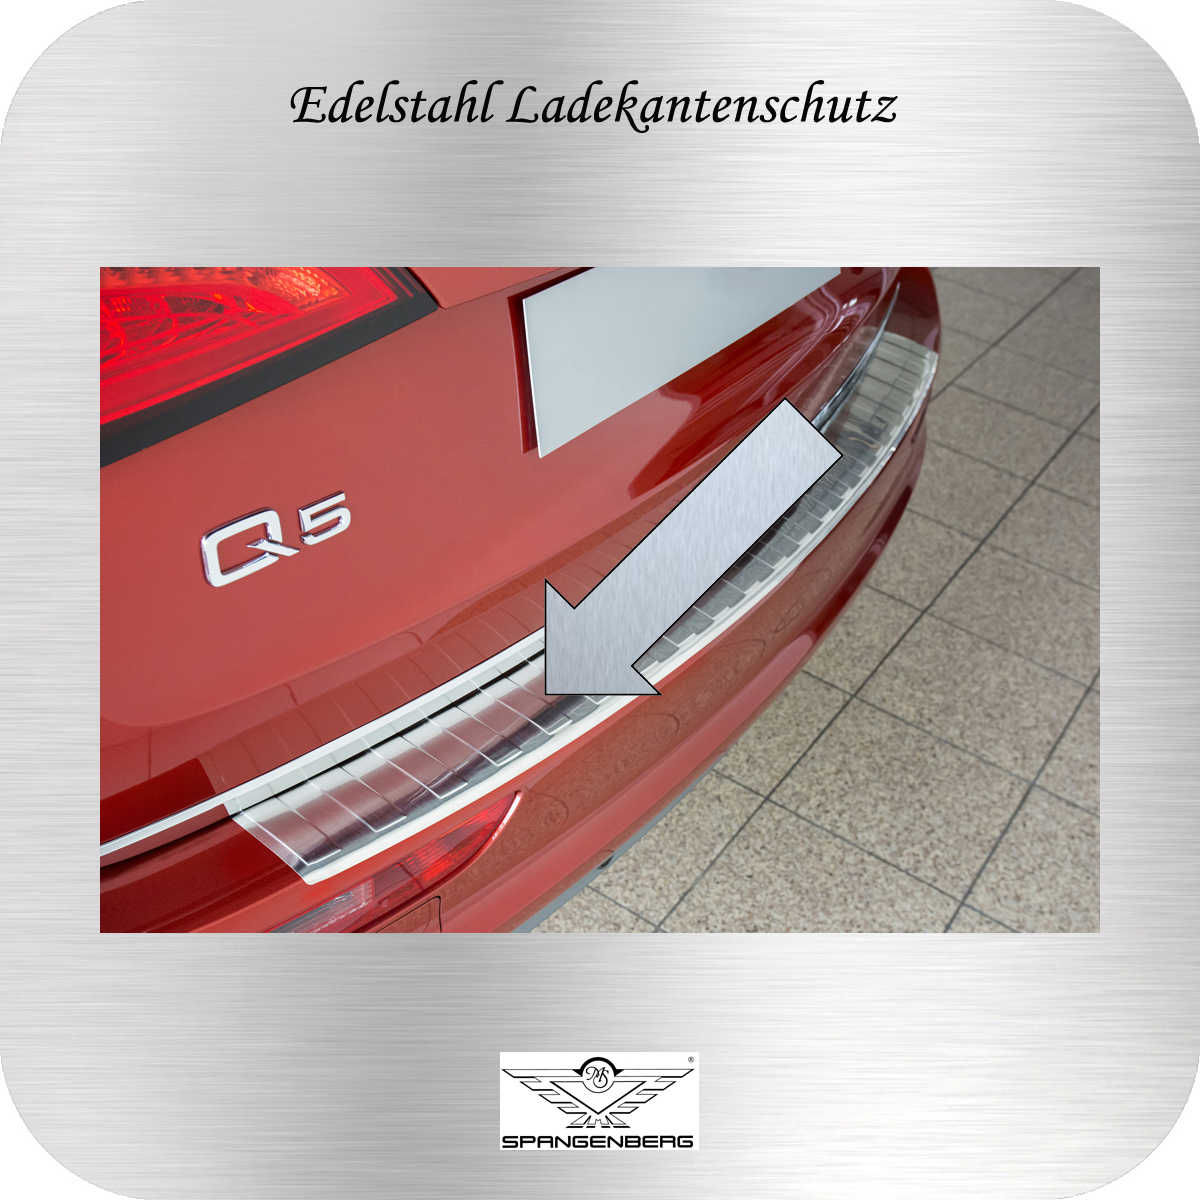 Ladekantenschutz Edelstahl Audi Q5 I SUV Typ 8R Kombi 2008-16 3235729